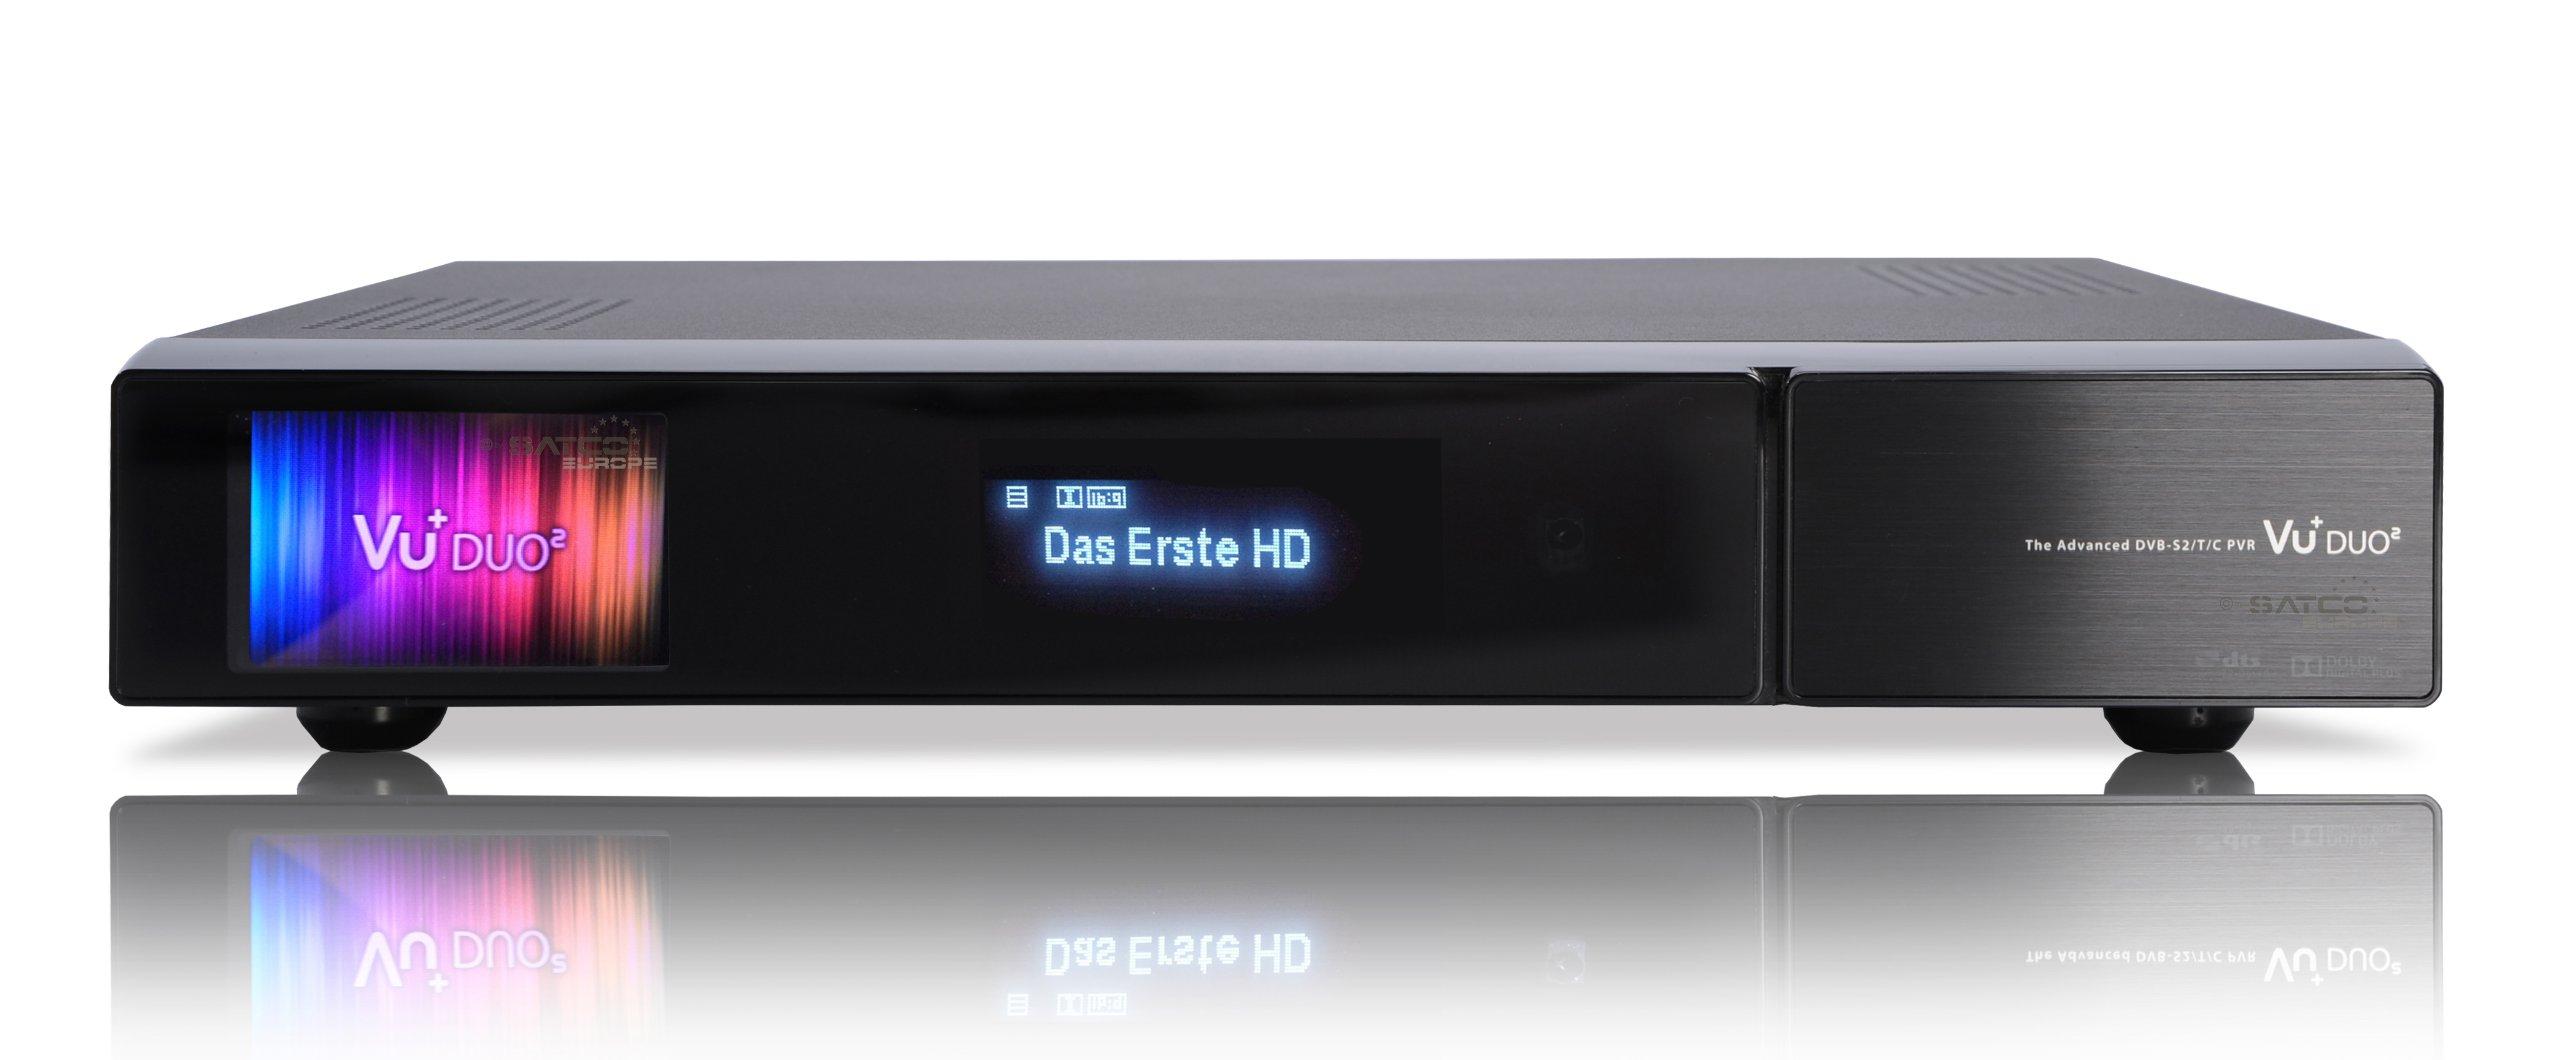 Vu+ DVB-S2 Tuner - Receptor de TV por satélite (disco duro de 1 TB), negro (importado): Amazon.es: Electrónica